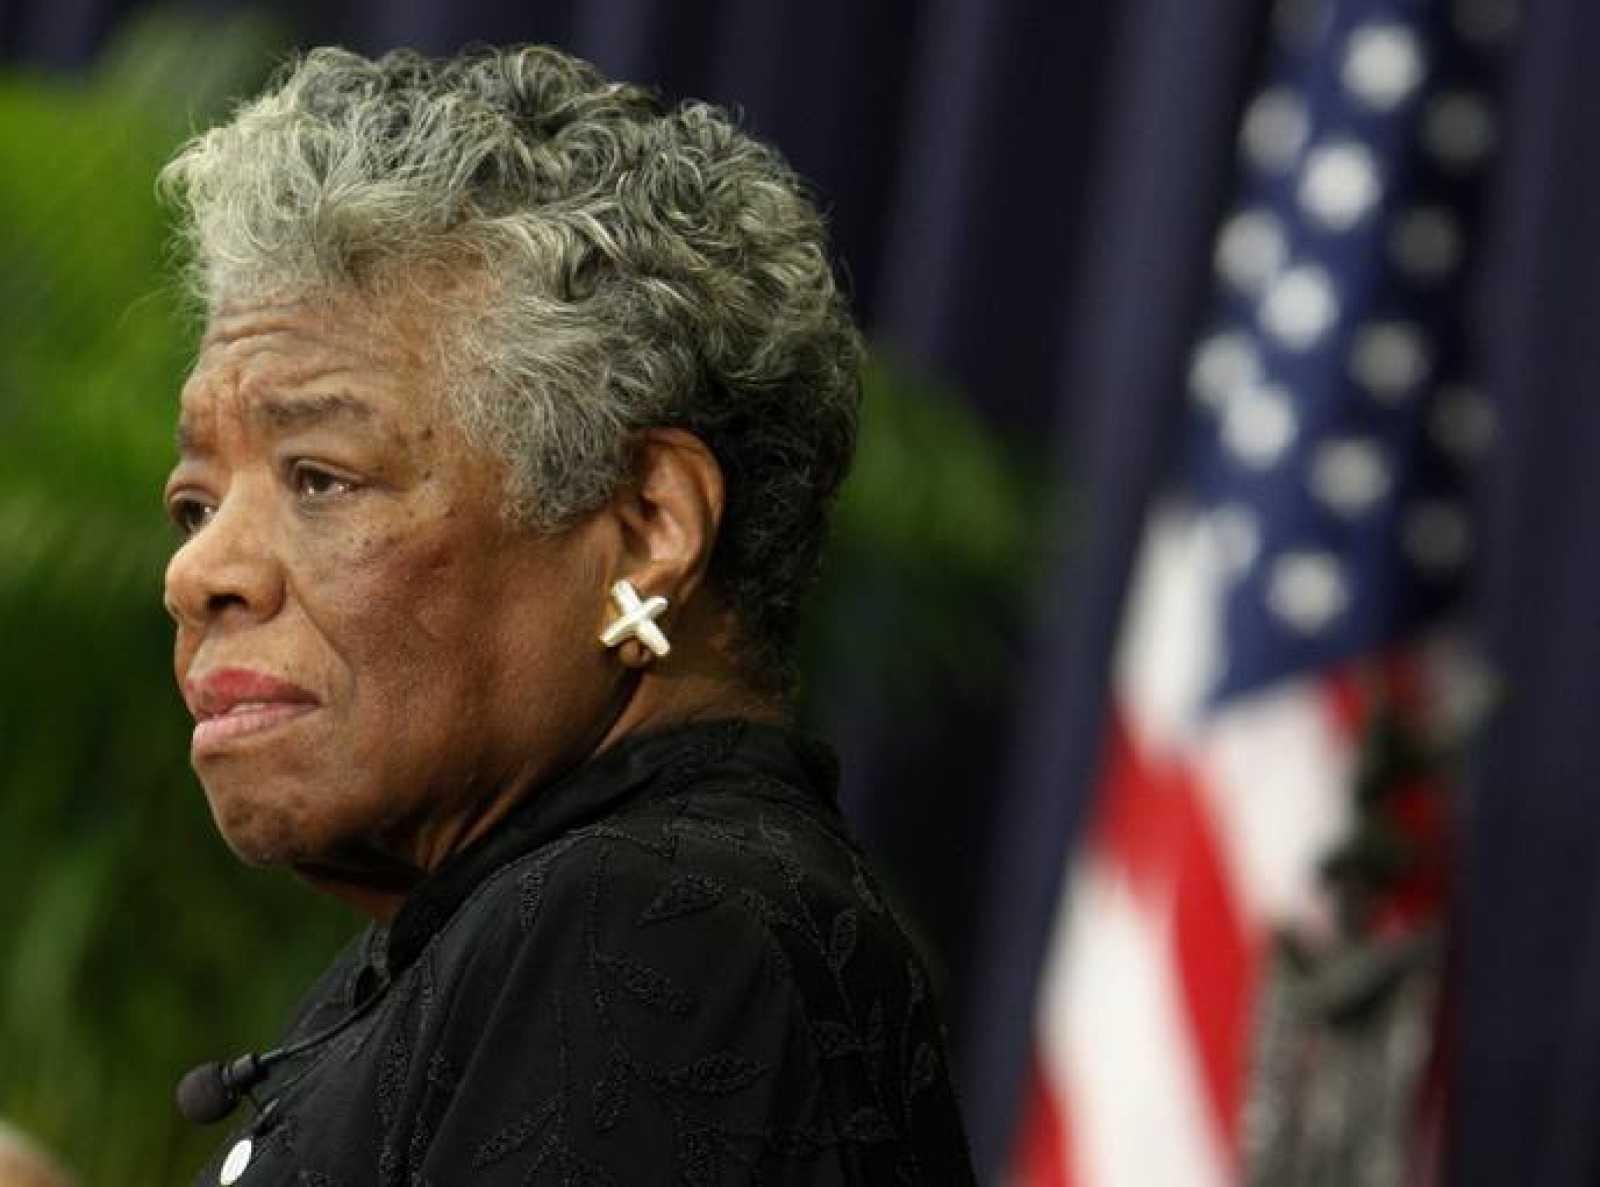 File photo of U.S. poet Maya Angelou speaking during a ceremony to honor South African Archbishop Emeritus Desmond Tutu in Washington